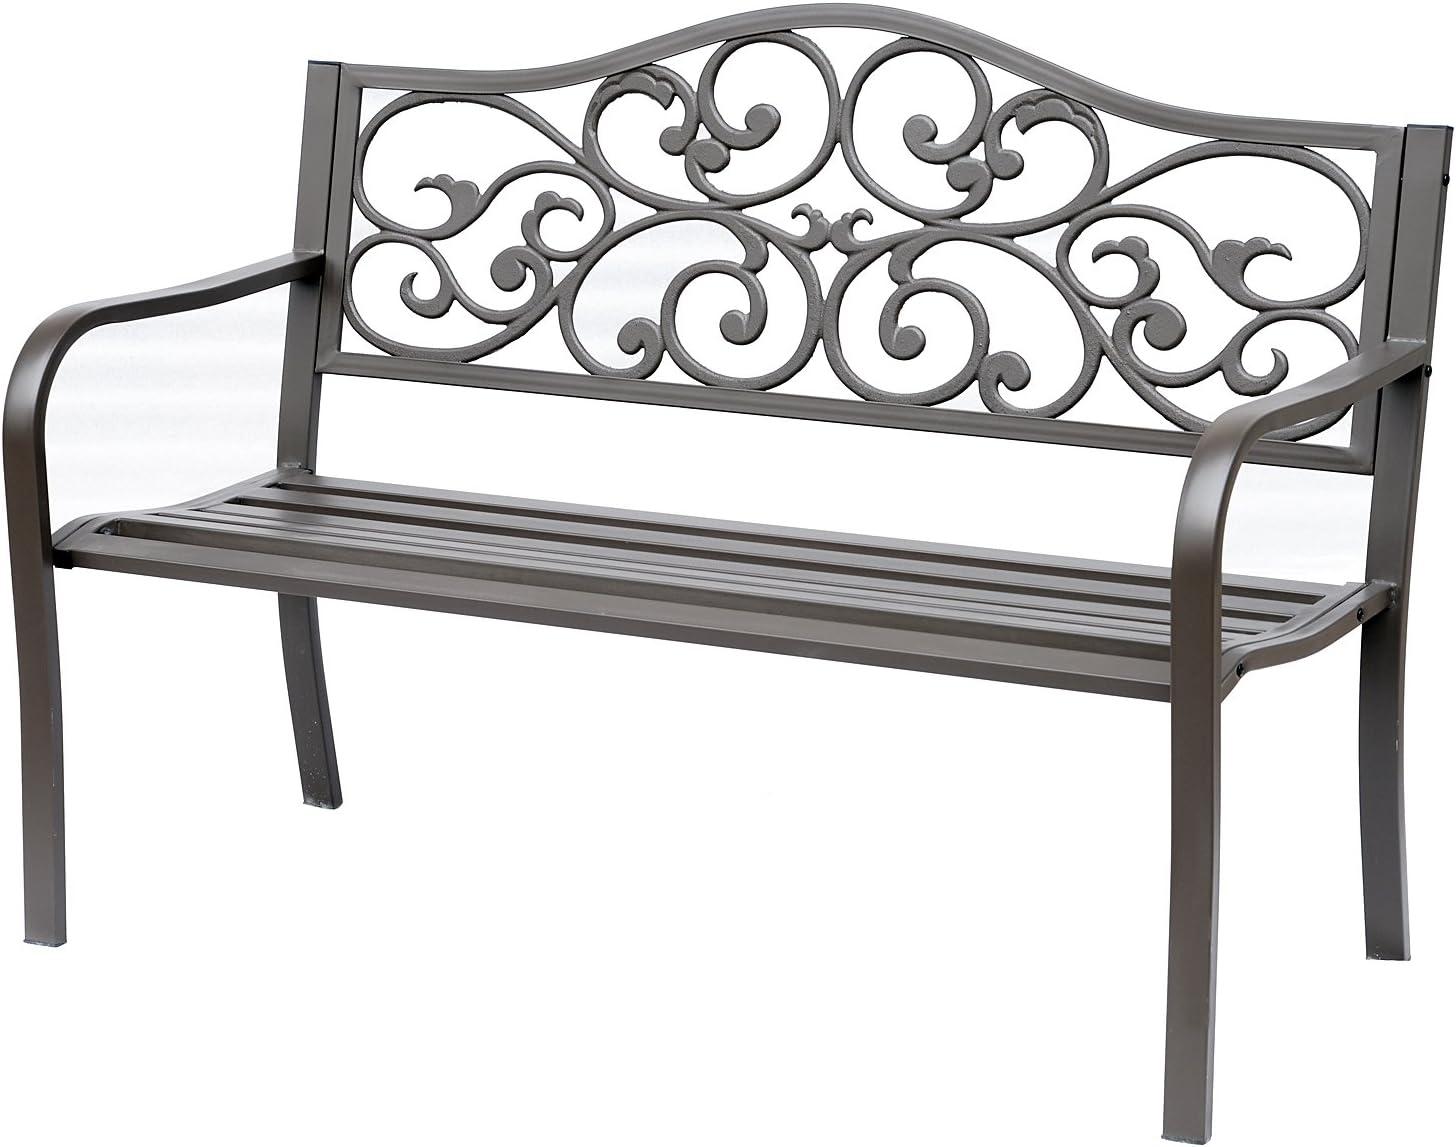 Outsunny 50 Vintage Floral Garden Cast Iron Patio Bench